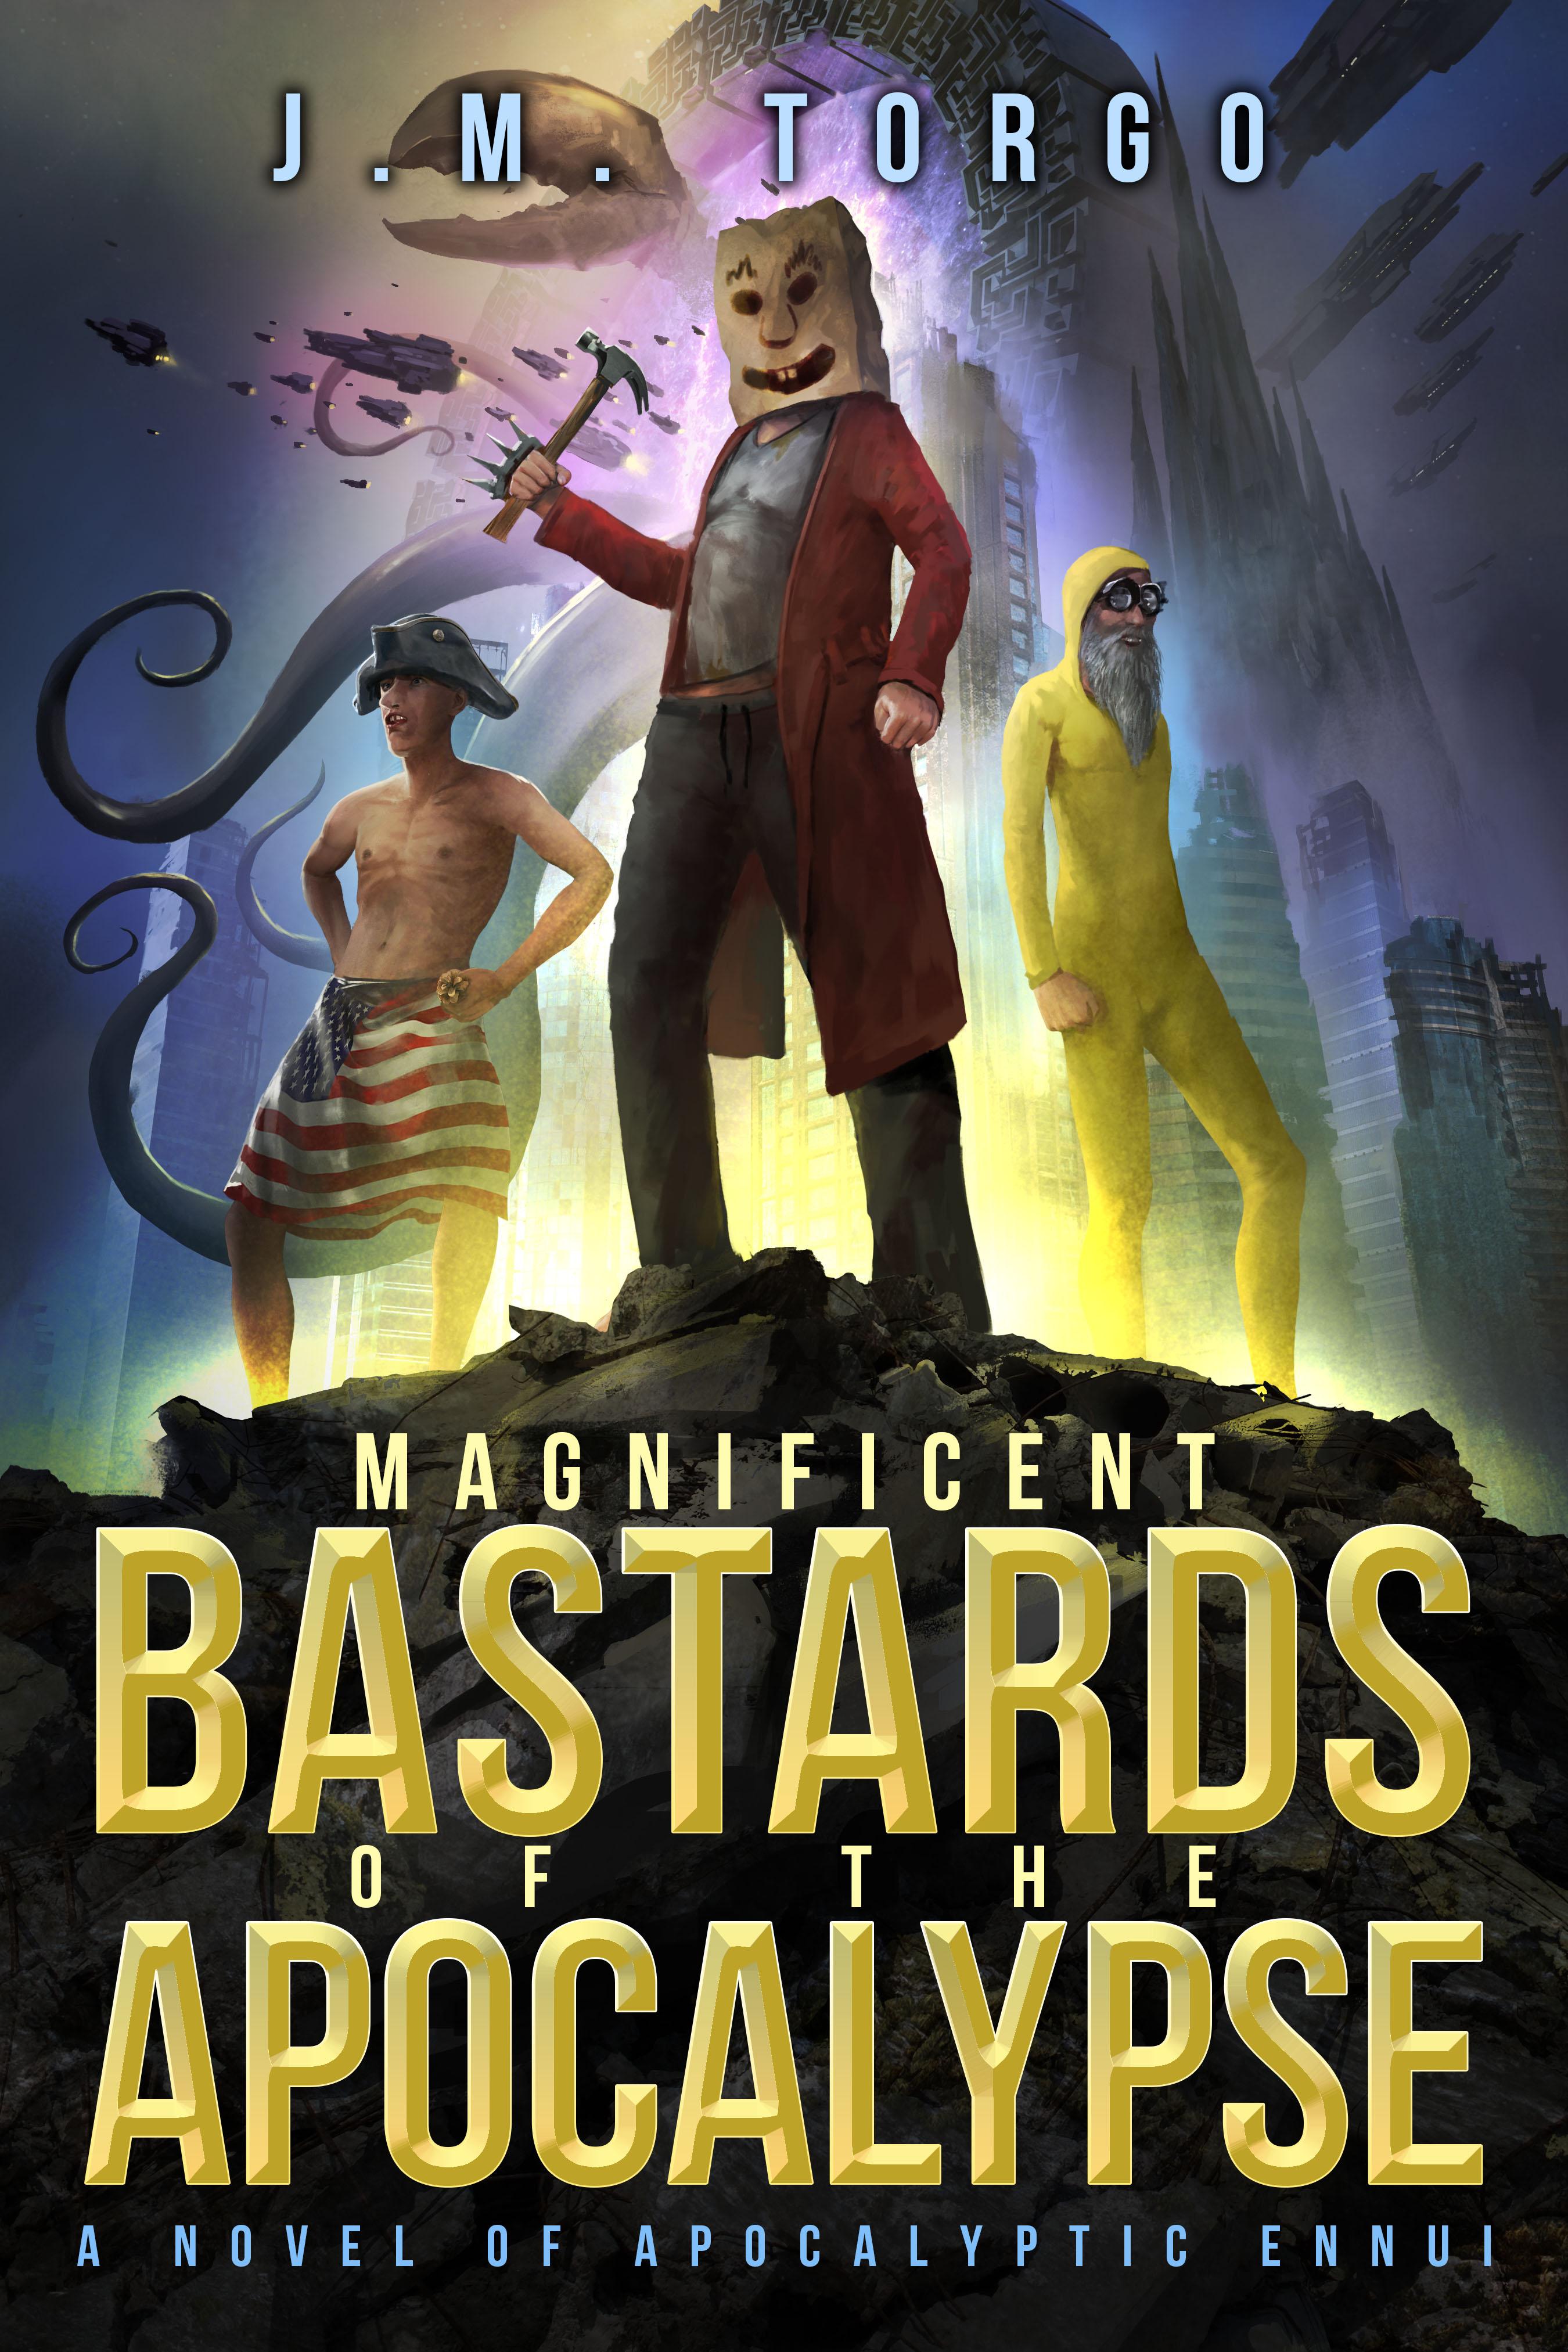 Magnificent Bastards of the Apocalypse